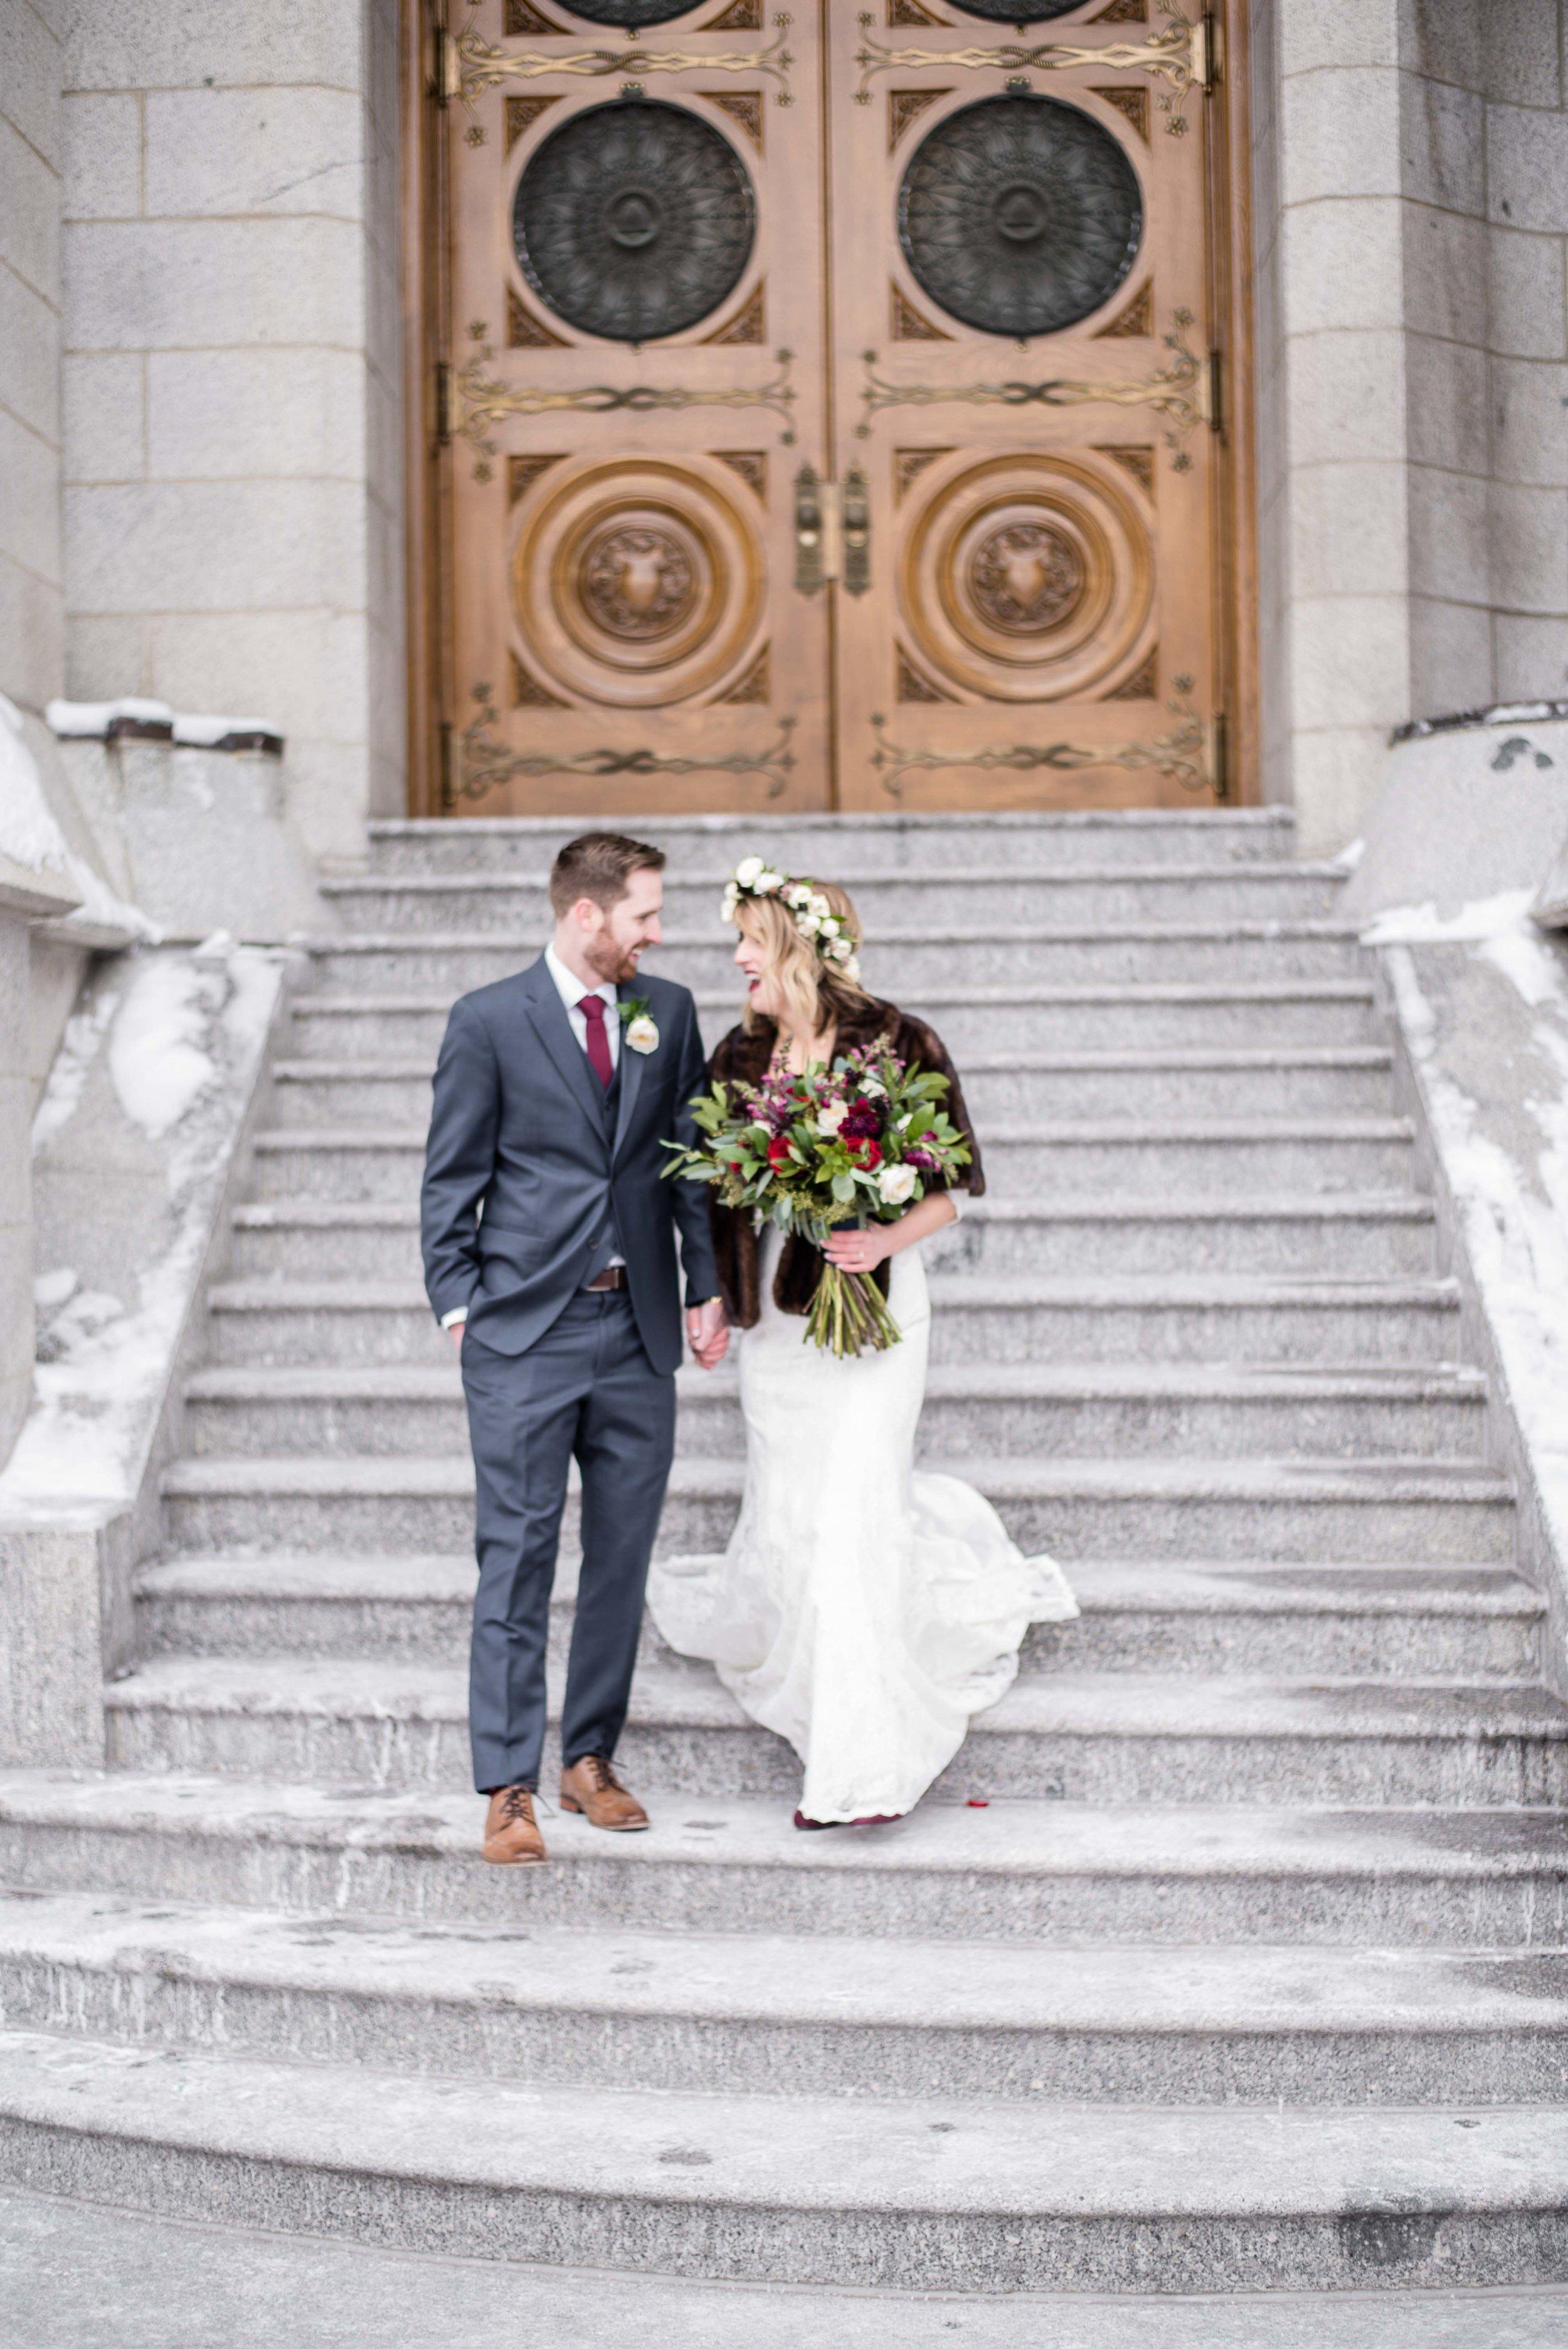 Tess+Garrett-Wedding-Day-Sadie-Banks-Photography-128.jpg